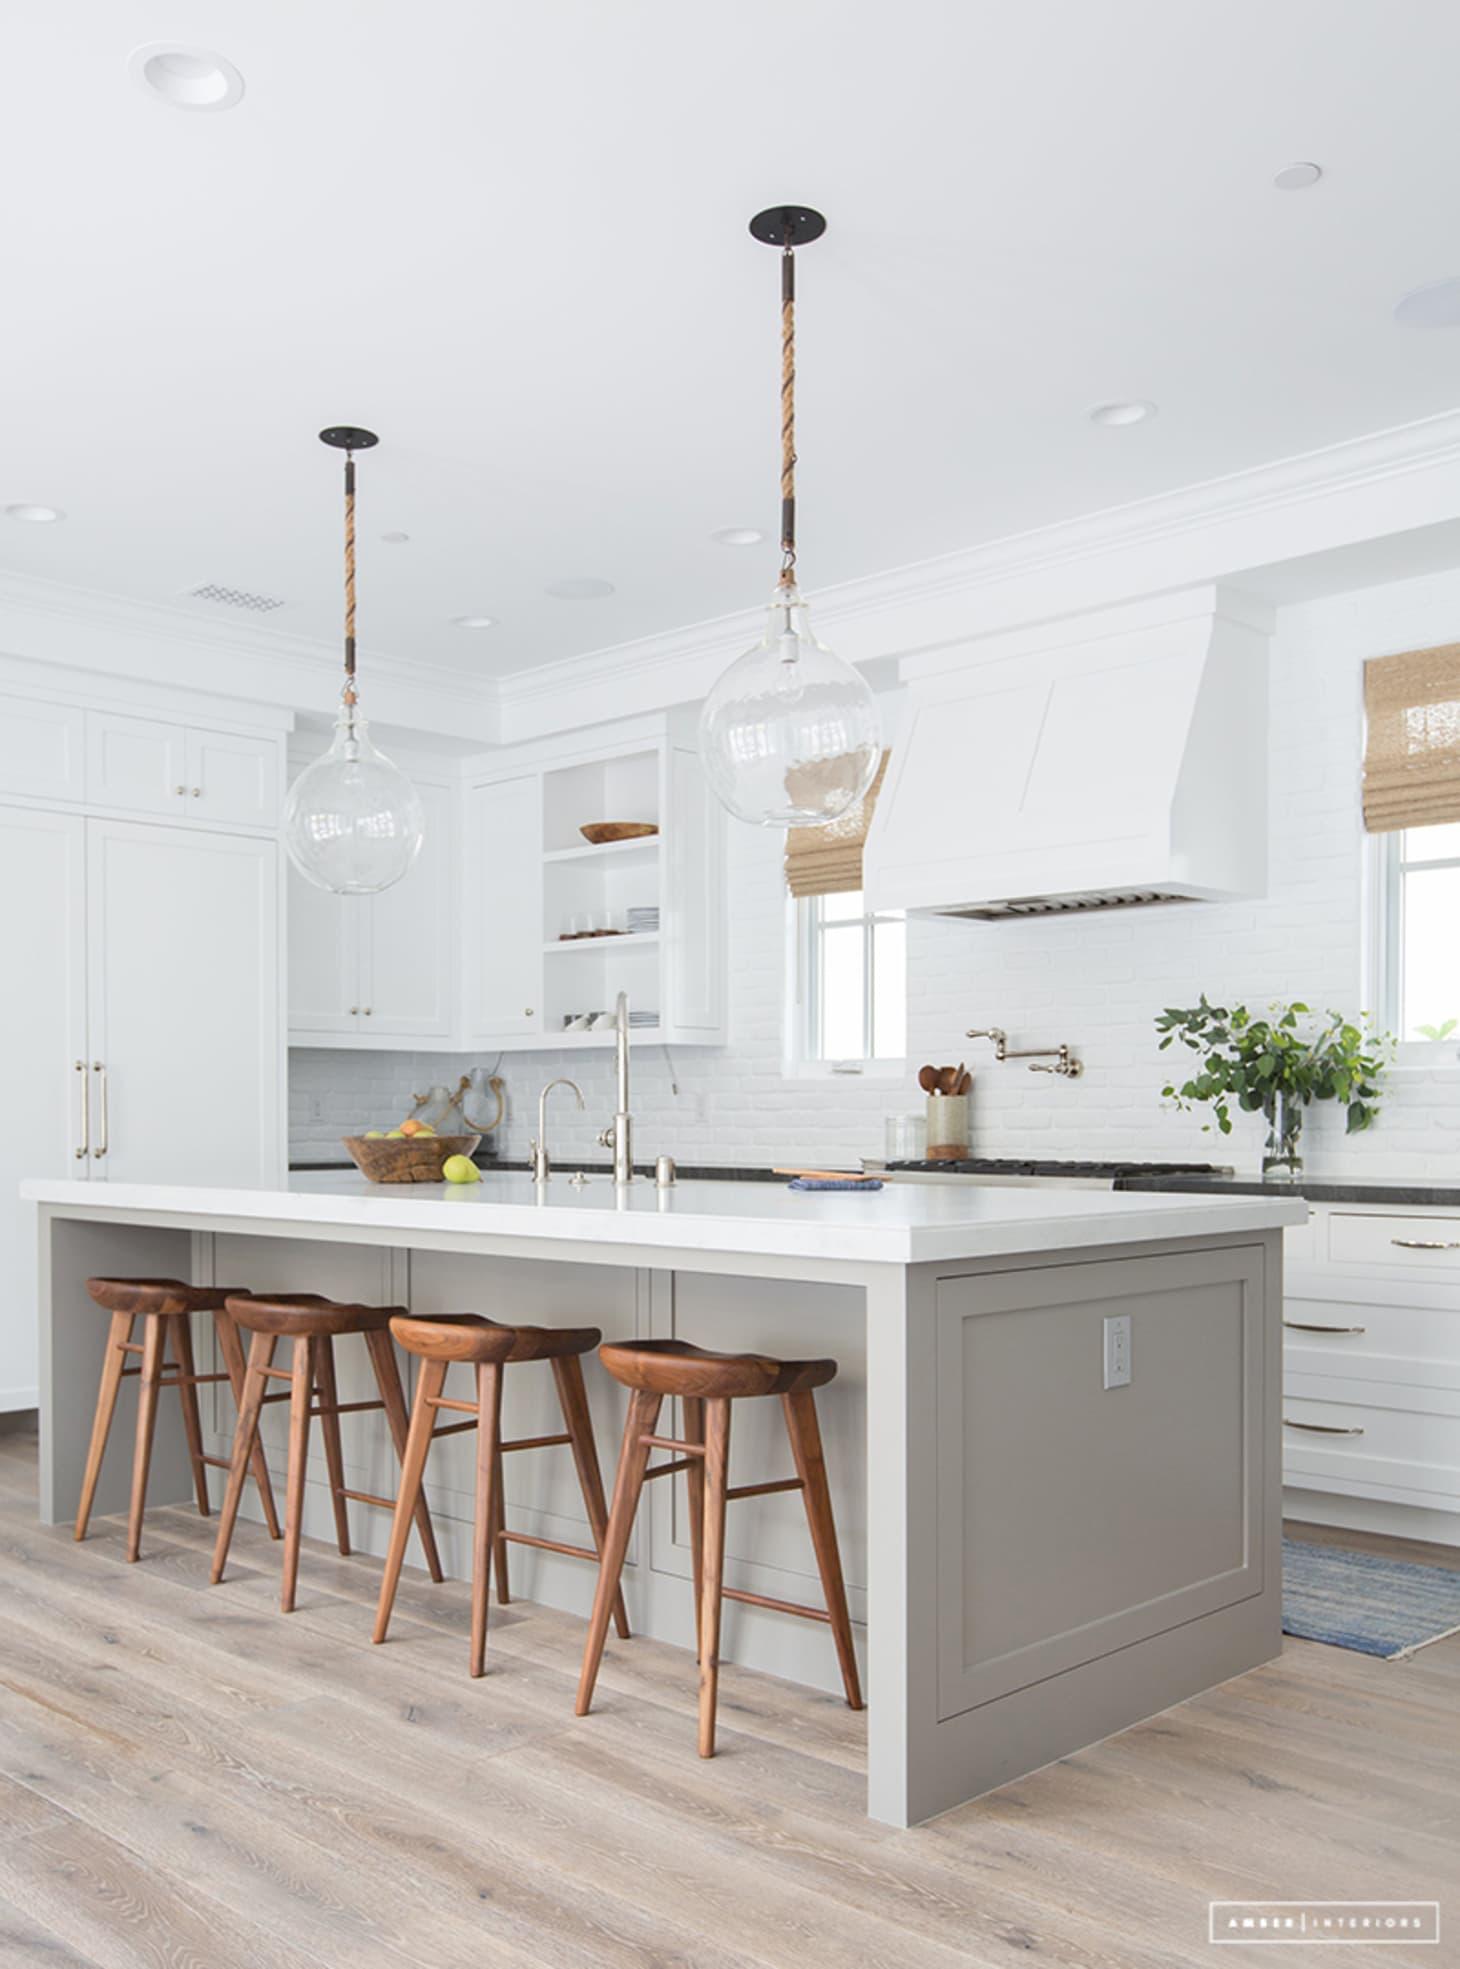 Painting Ideas - Neutral Kitchen Cabinet Colors ...